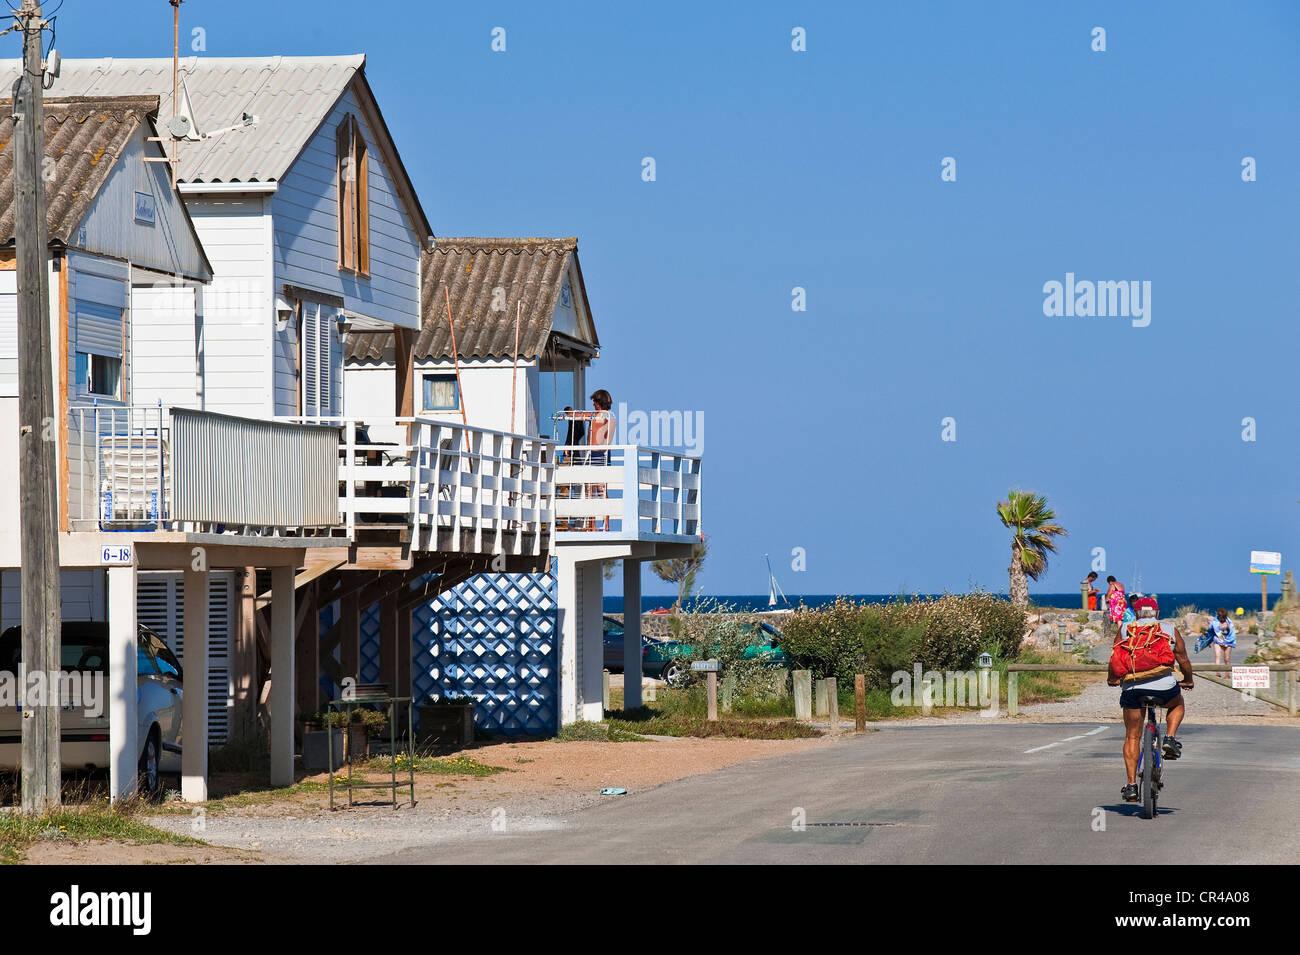 Plage Des Chalets A Gruissan france, aude, corbieres, gruissan plage, village with